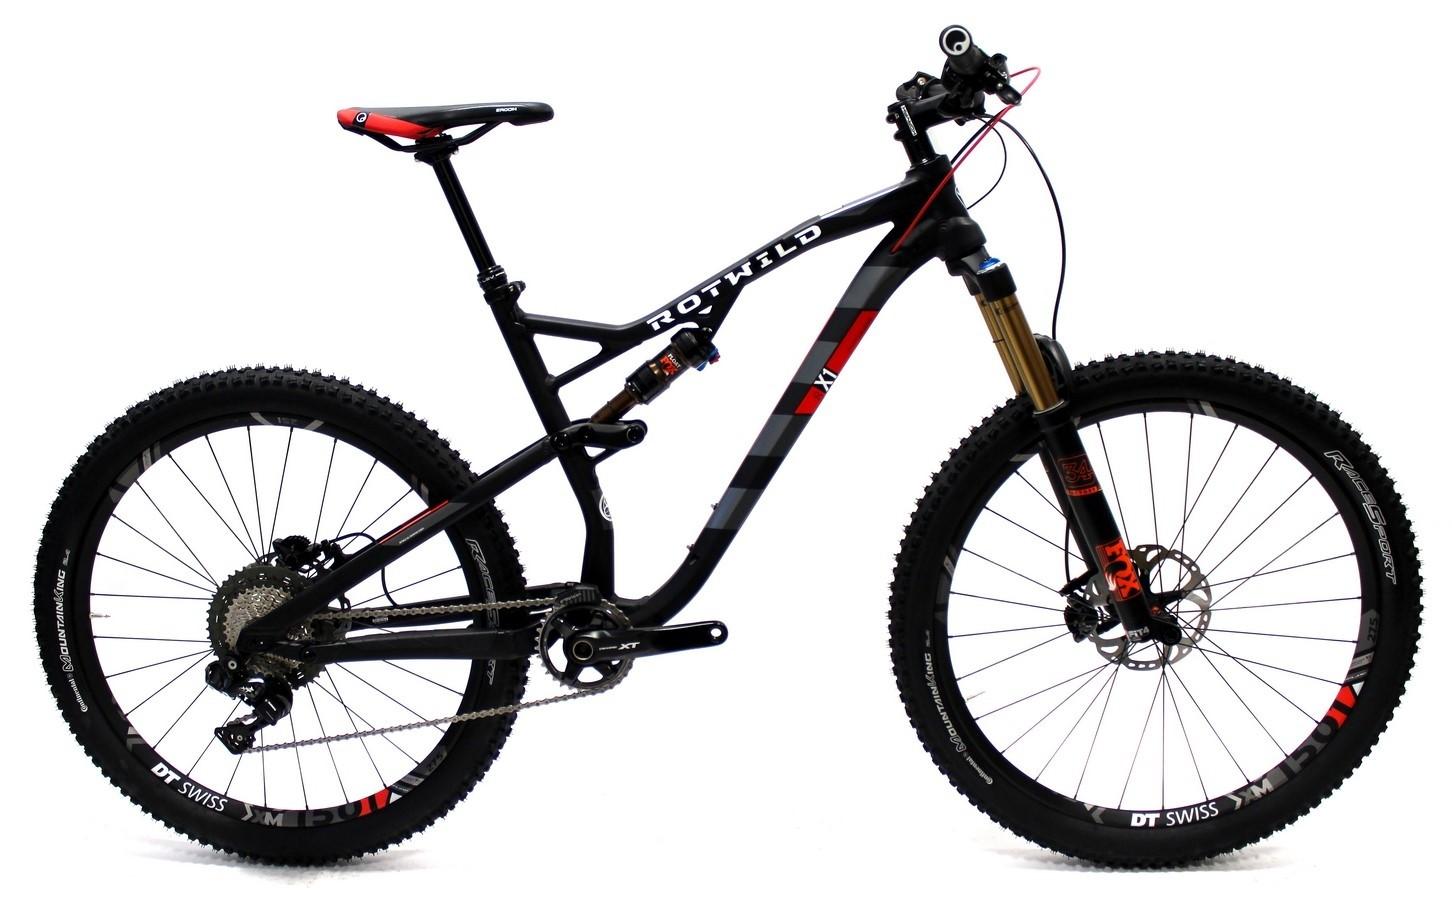 X1 FS 27.5 Evo schwarz-matt